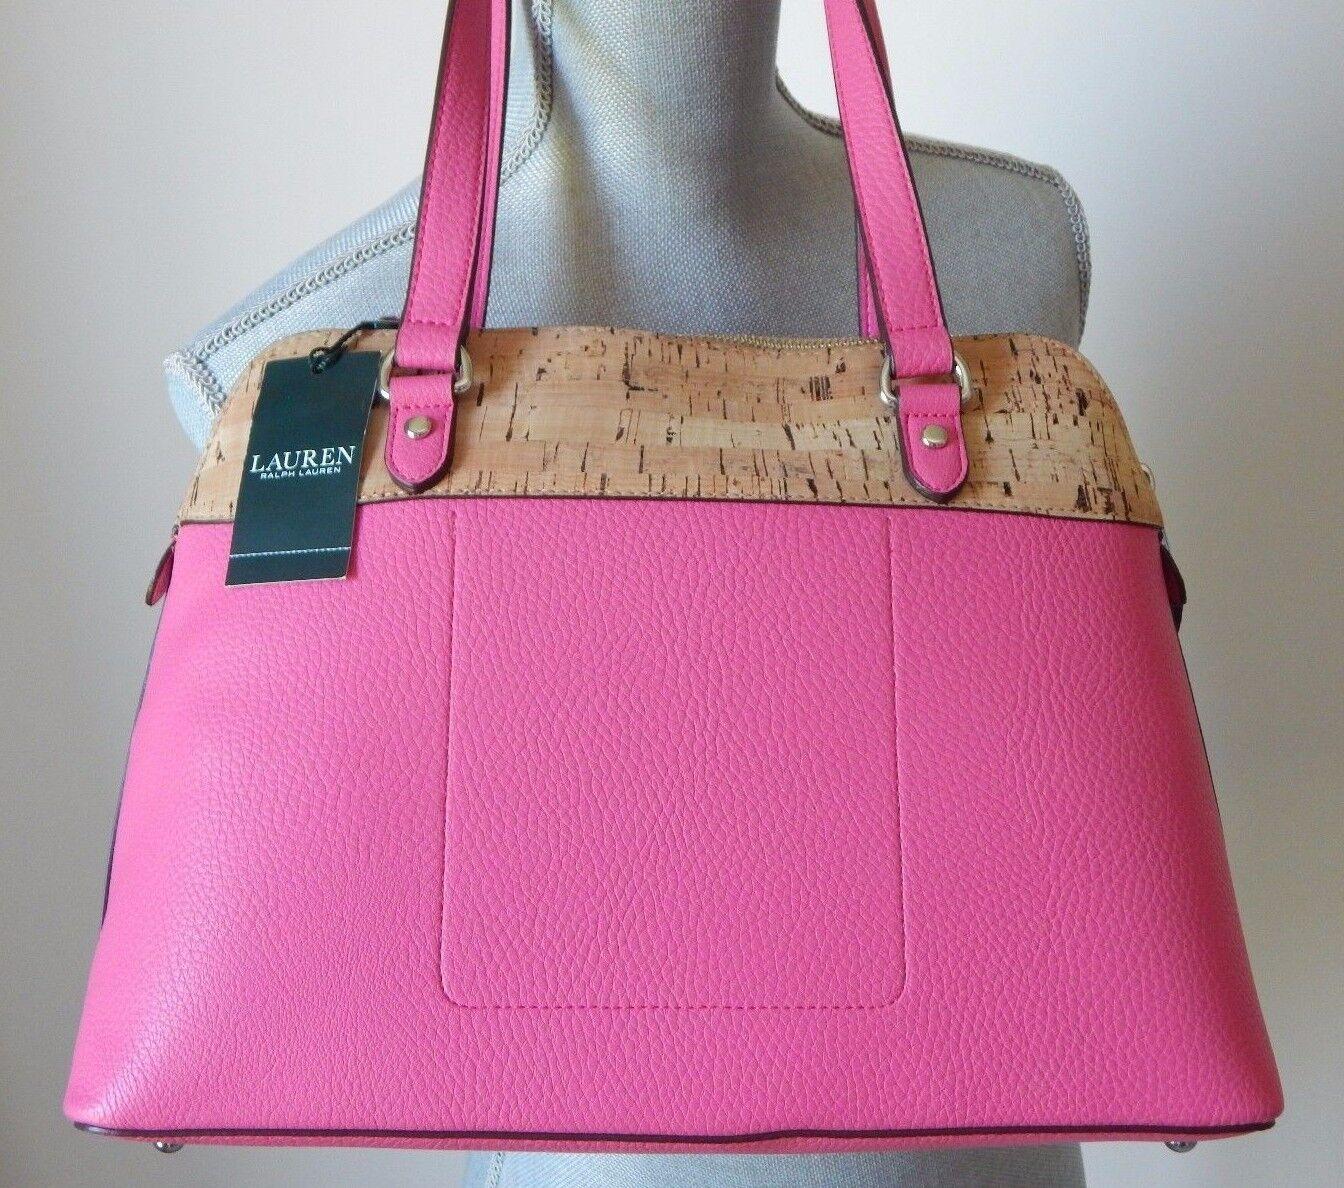 74a5ce5303 Ralph Lauren Hanway Cork Faux Leather Dome Satchel Light Azalea Pink ...